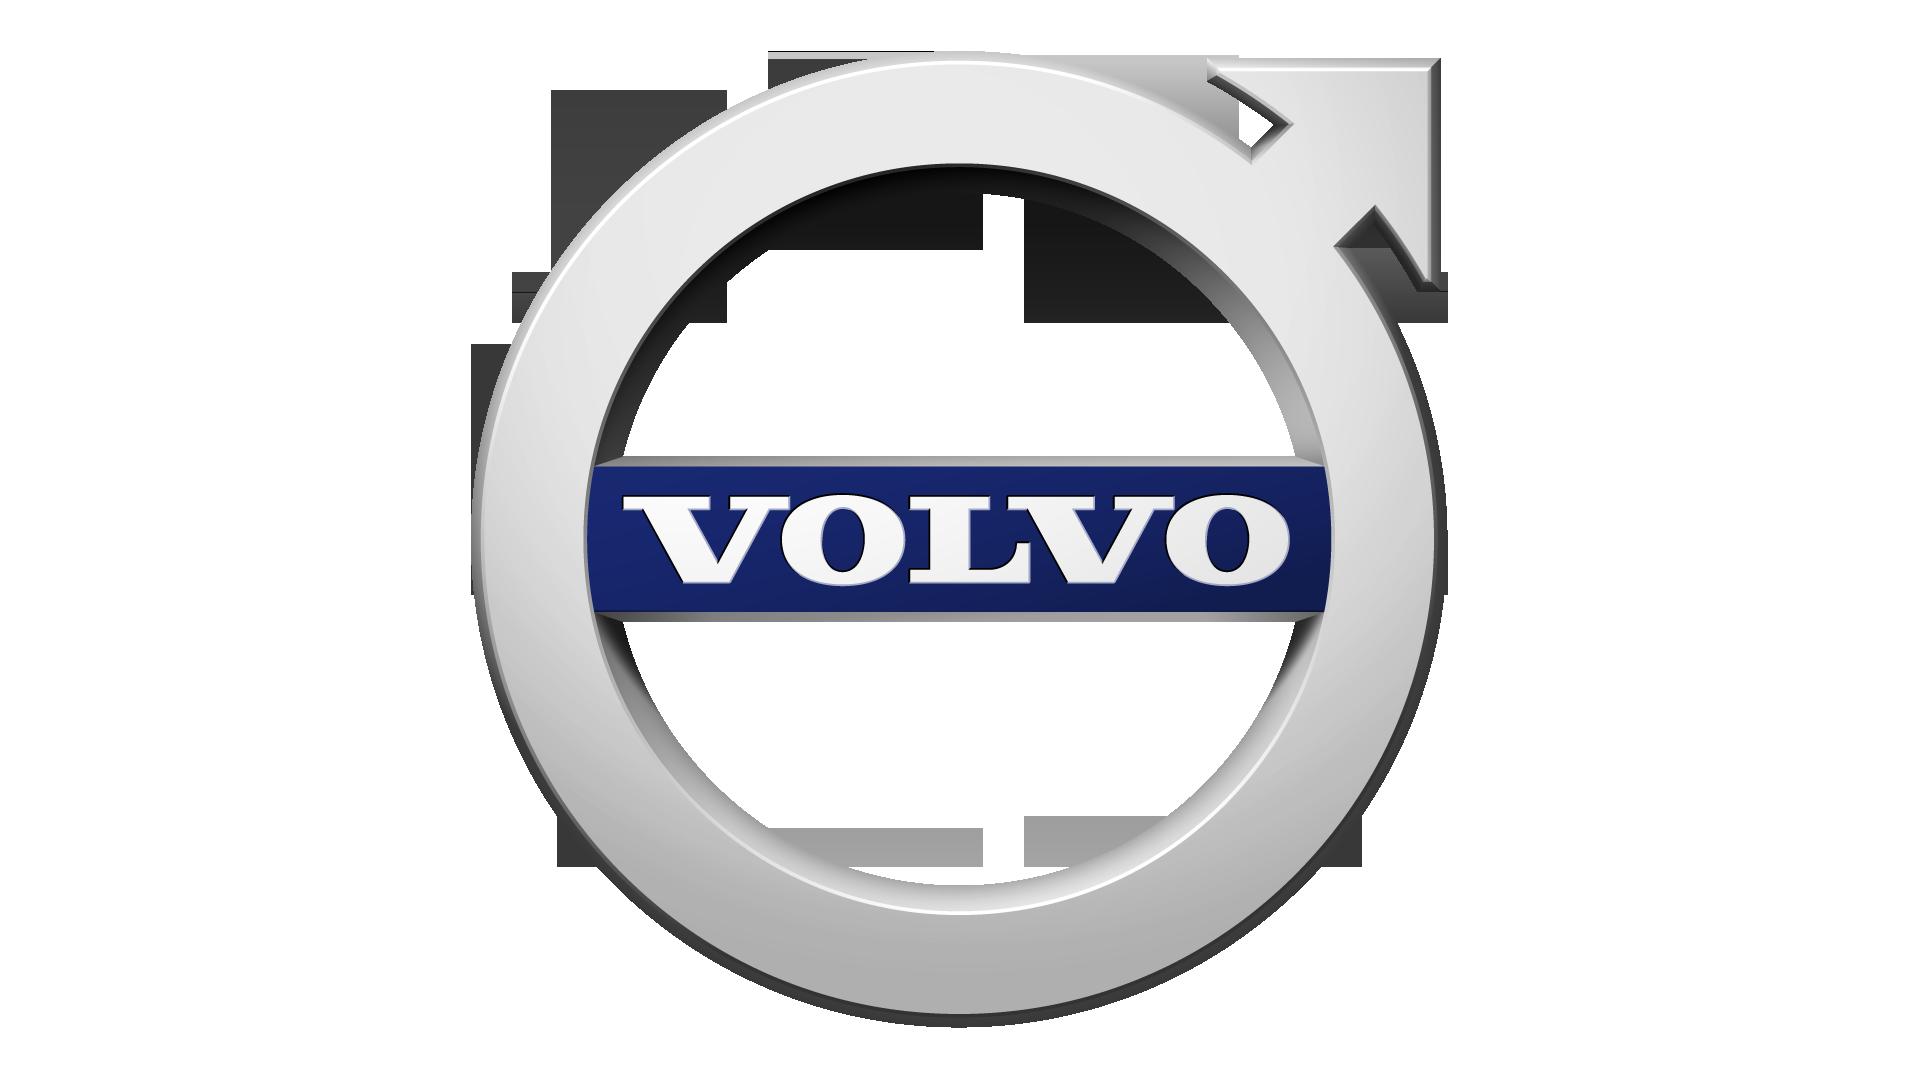 Volvo Logo Hd Png Meaning Information Carlogos Org